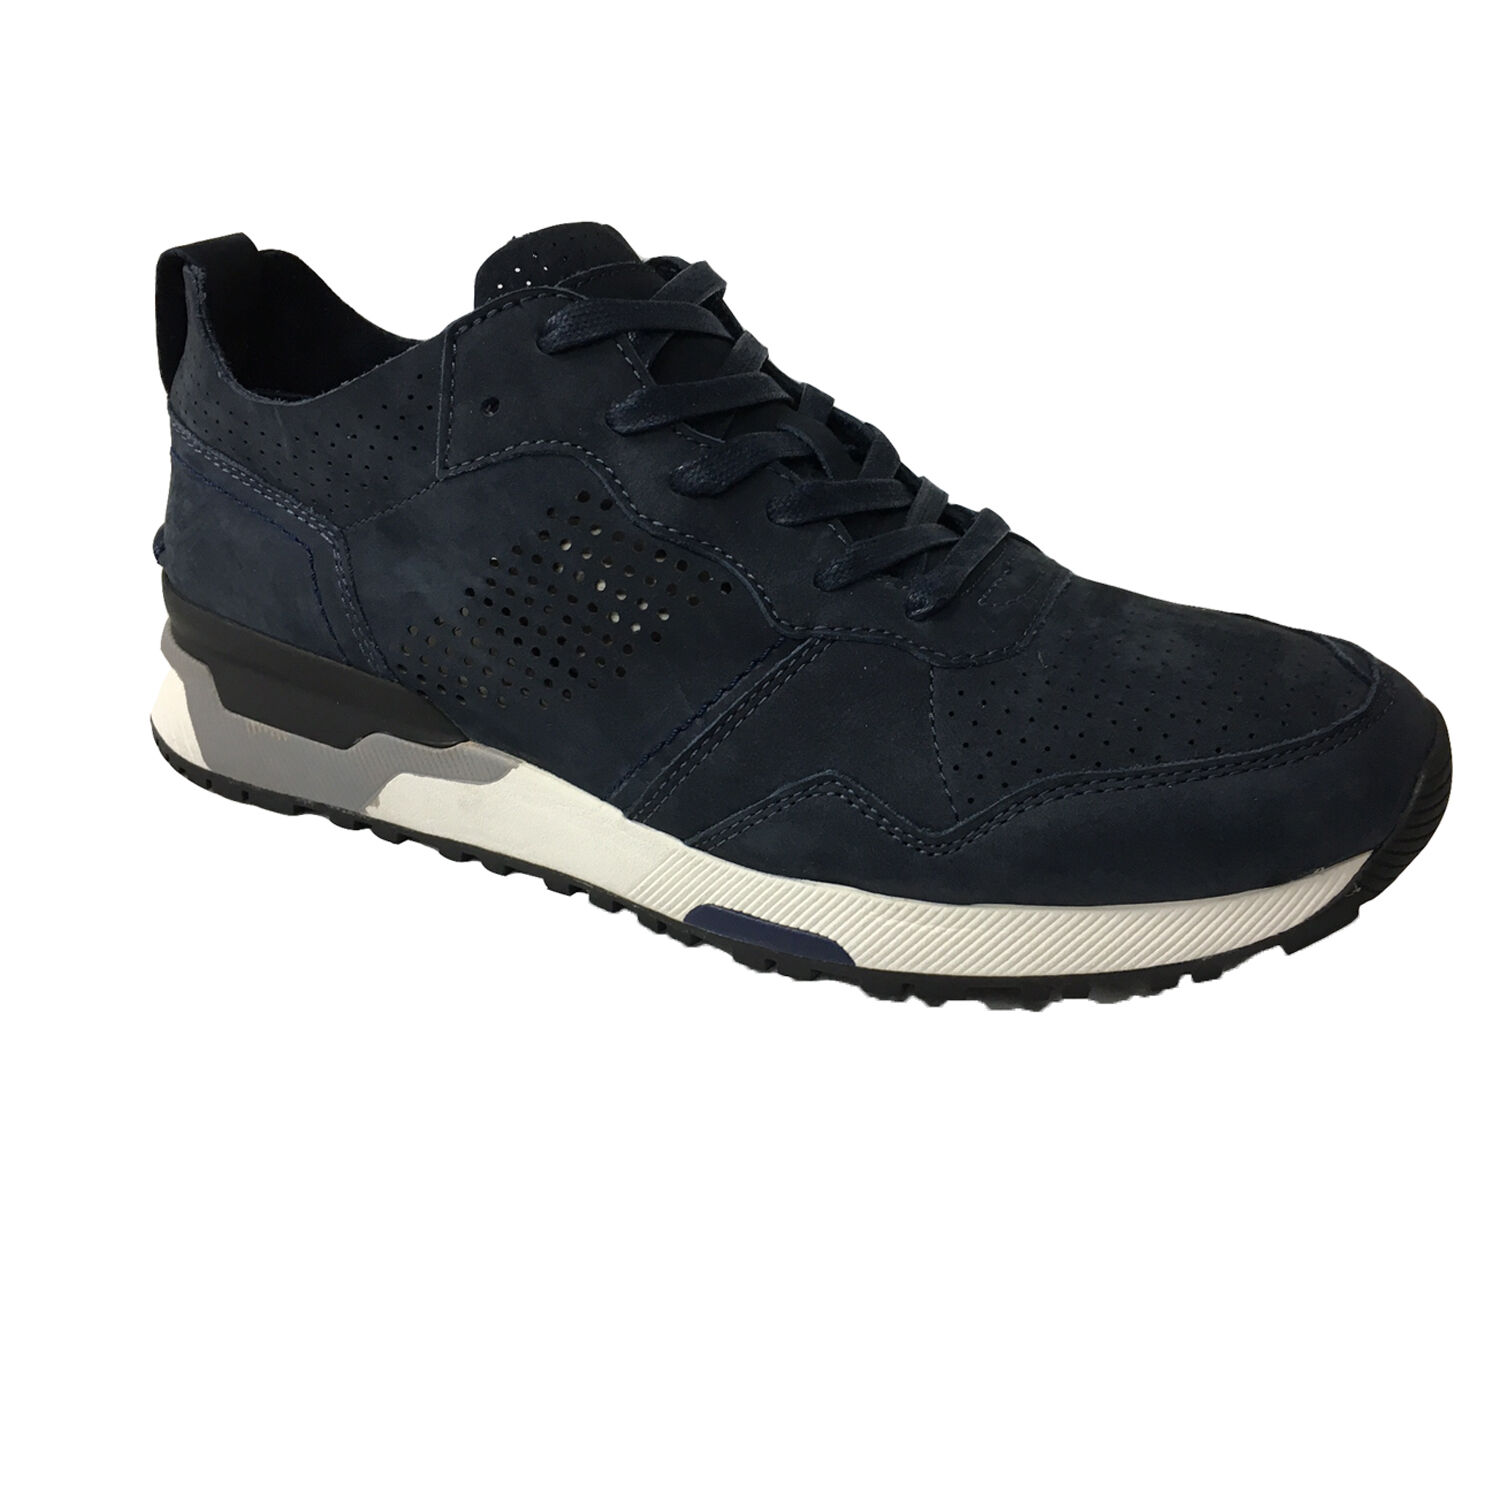 CRIME LONDON scarpa uomo blu sfoderata mod 11524S17B 100% pelle scamosciata